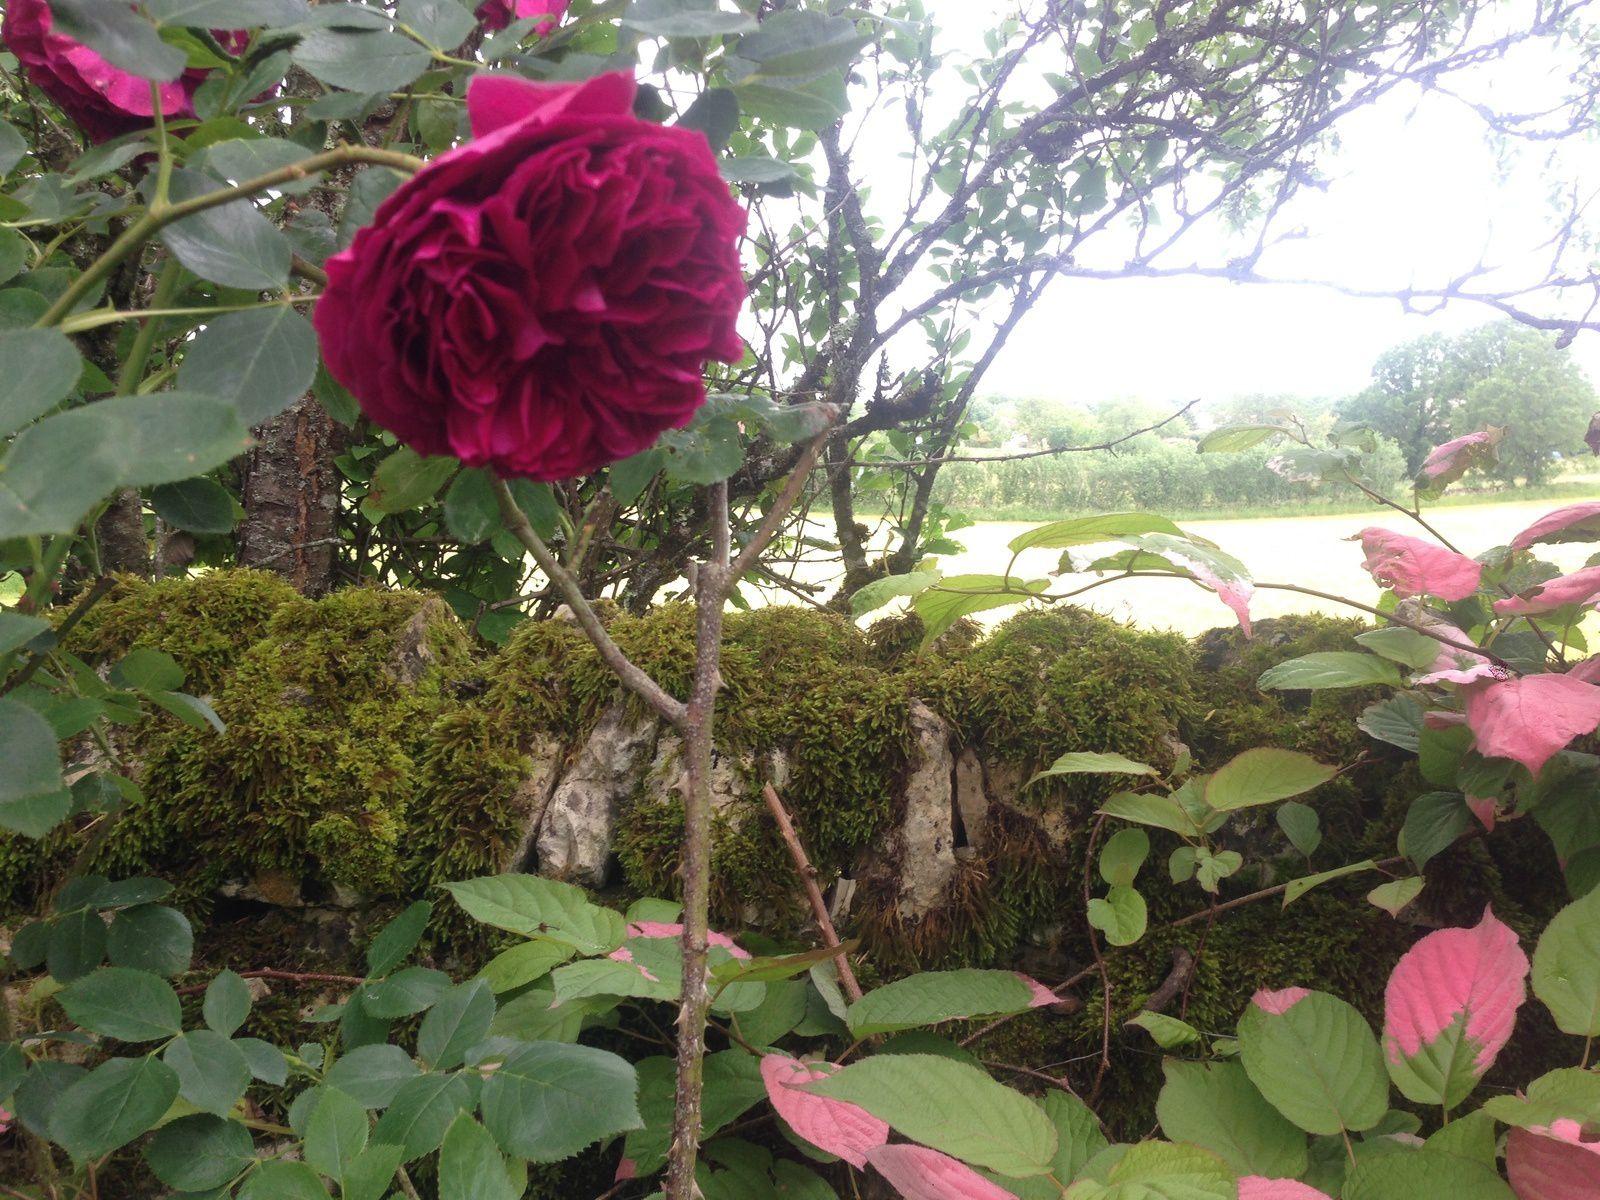 Actinidia kolomikta (aux côtés du rosier 'Falstaff') - Jardin de la Barrière